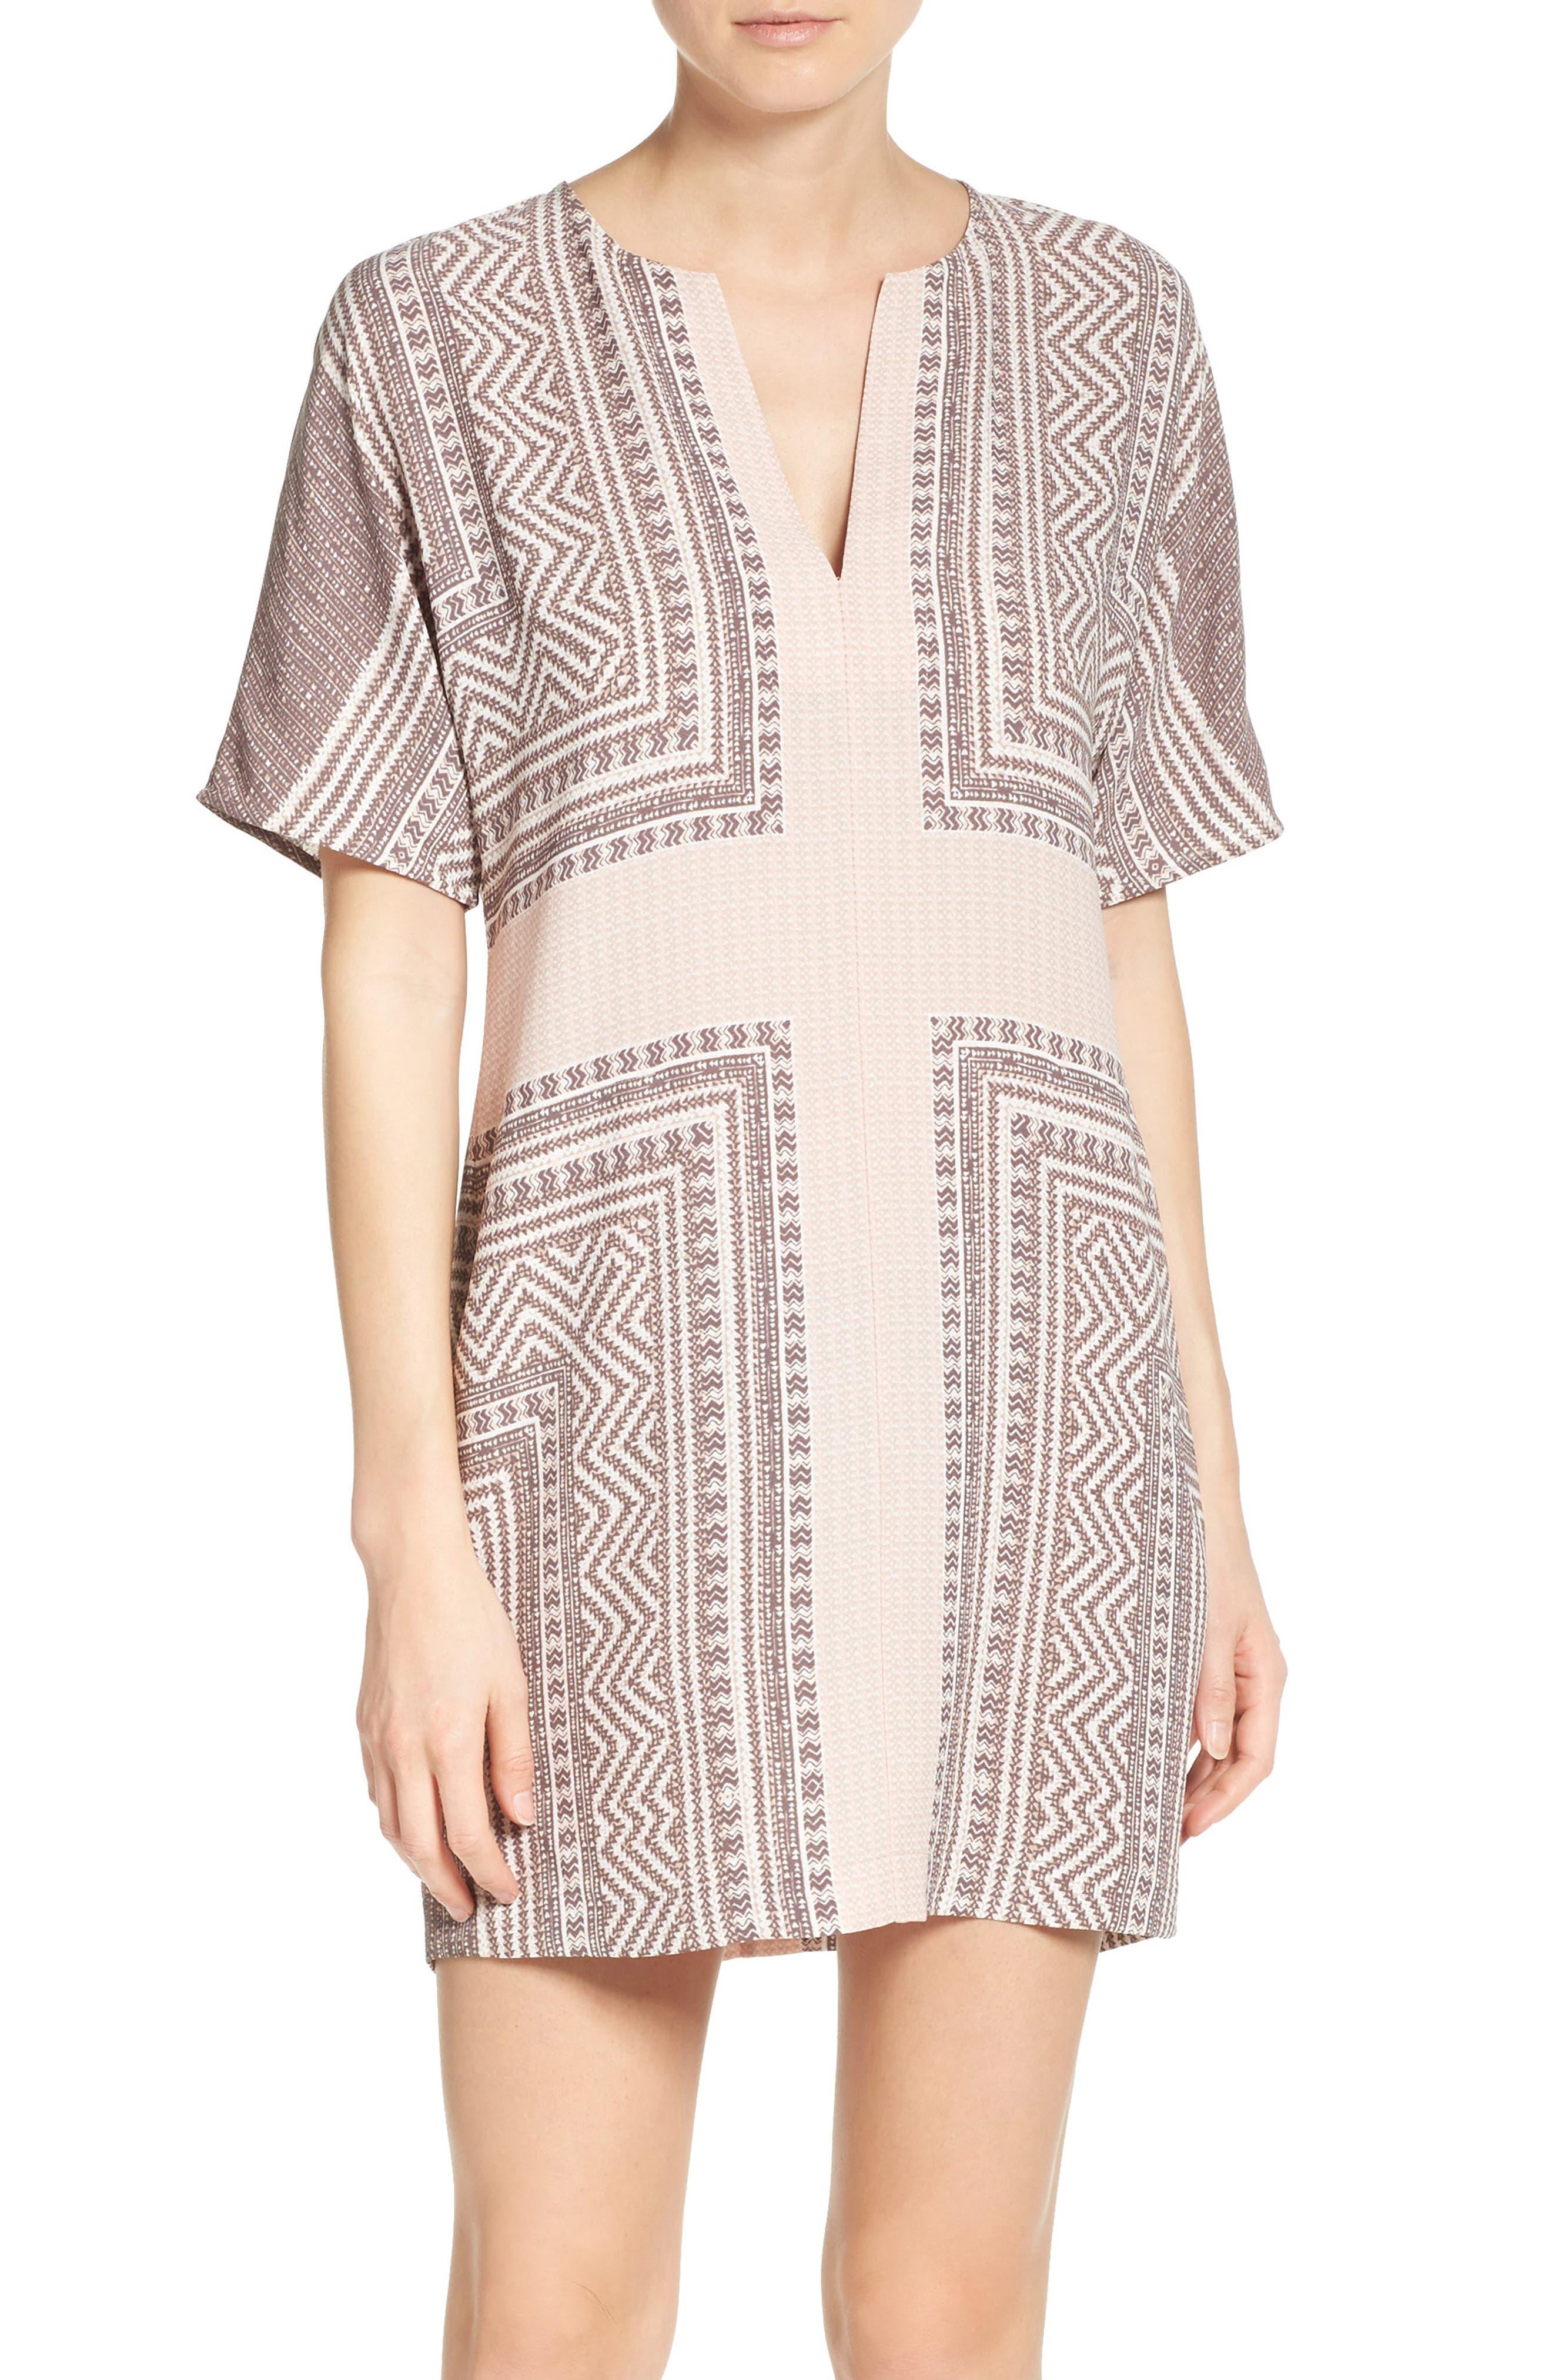 Alternate Image 1 Selected - BCBGMAXAZRIA Scarf Print Dress